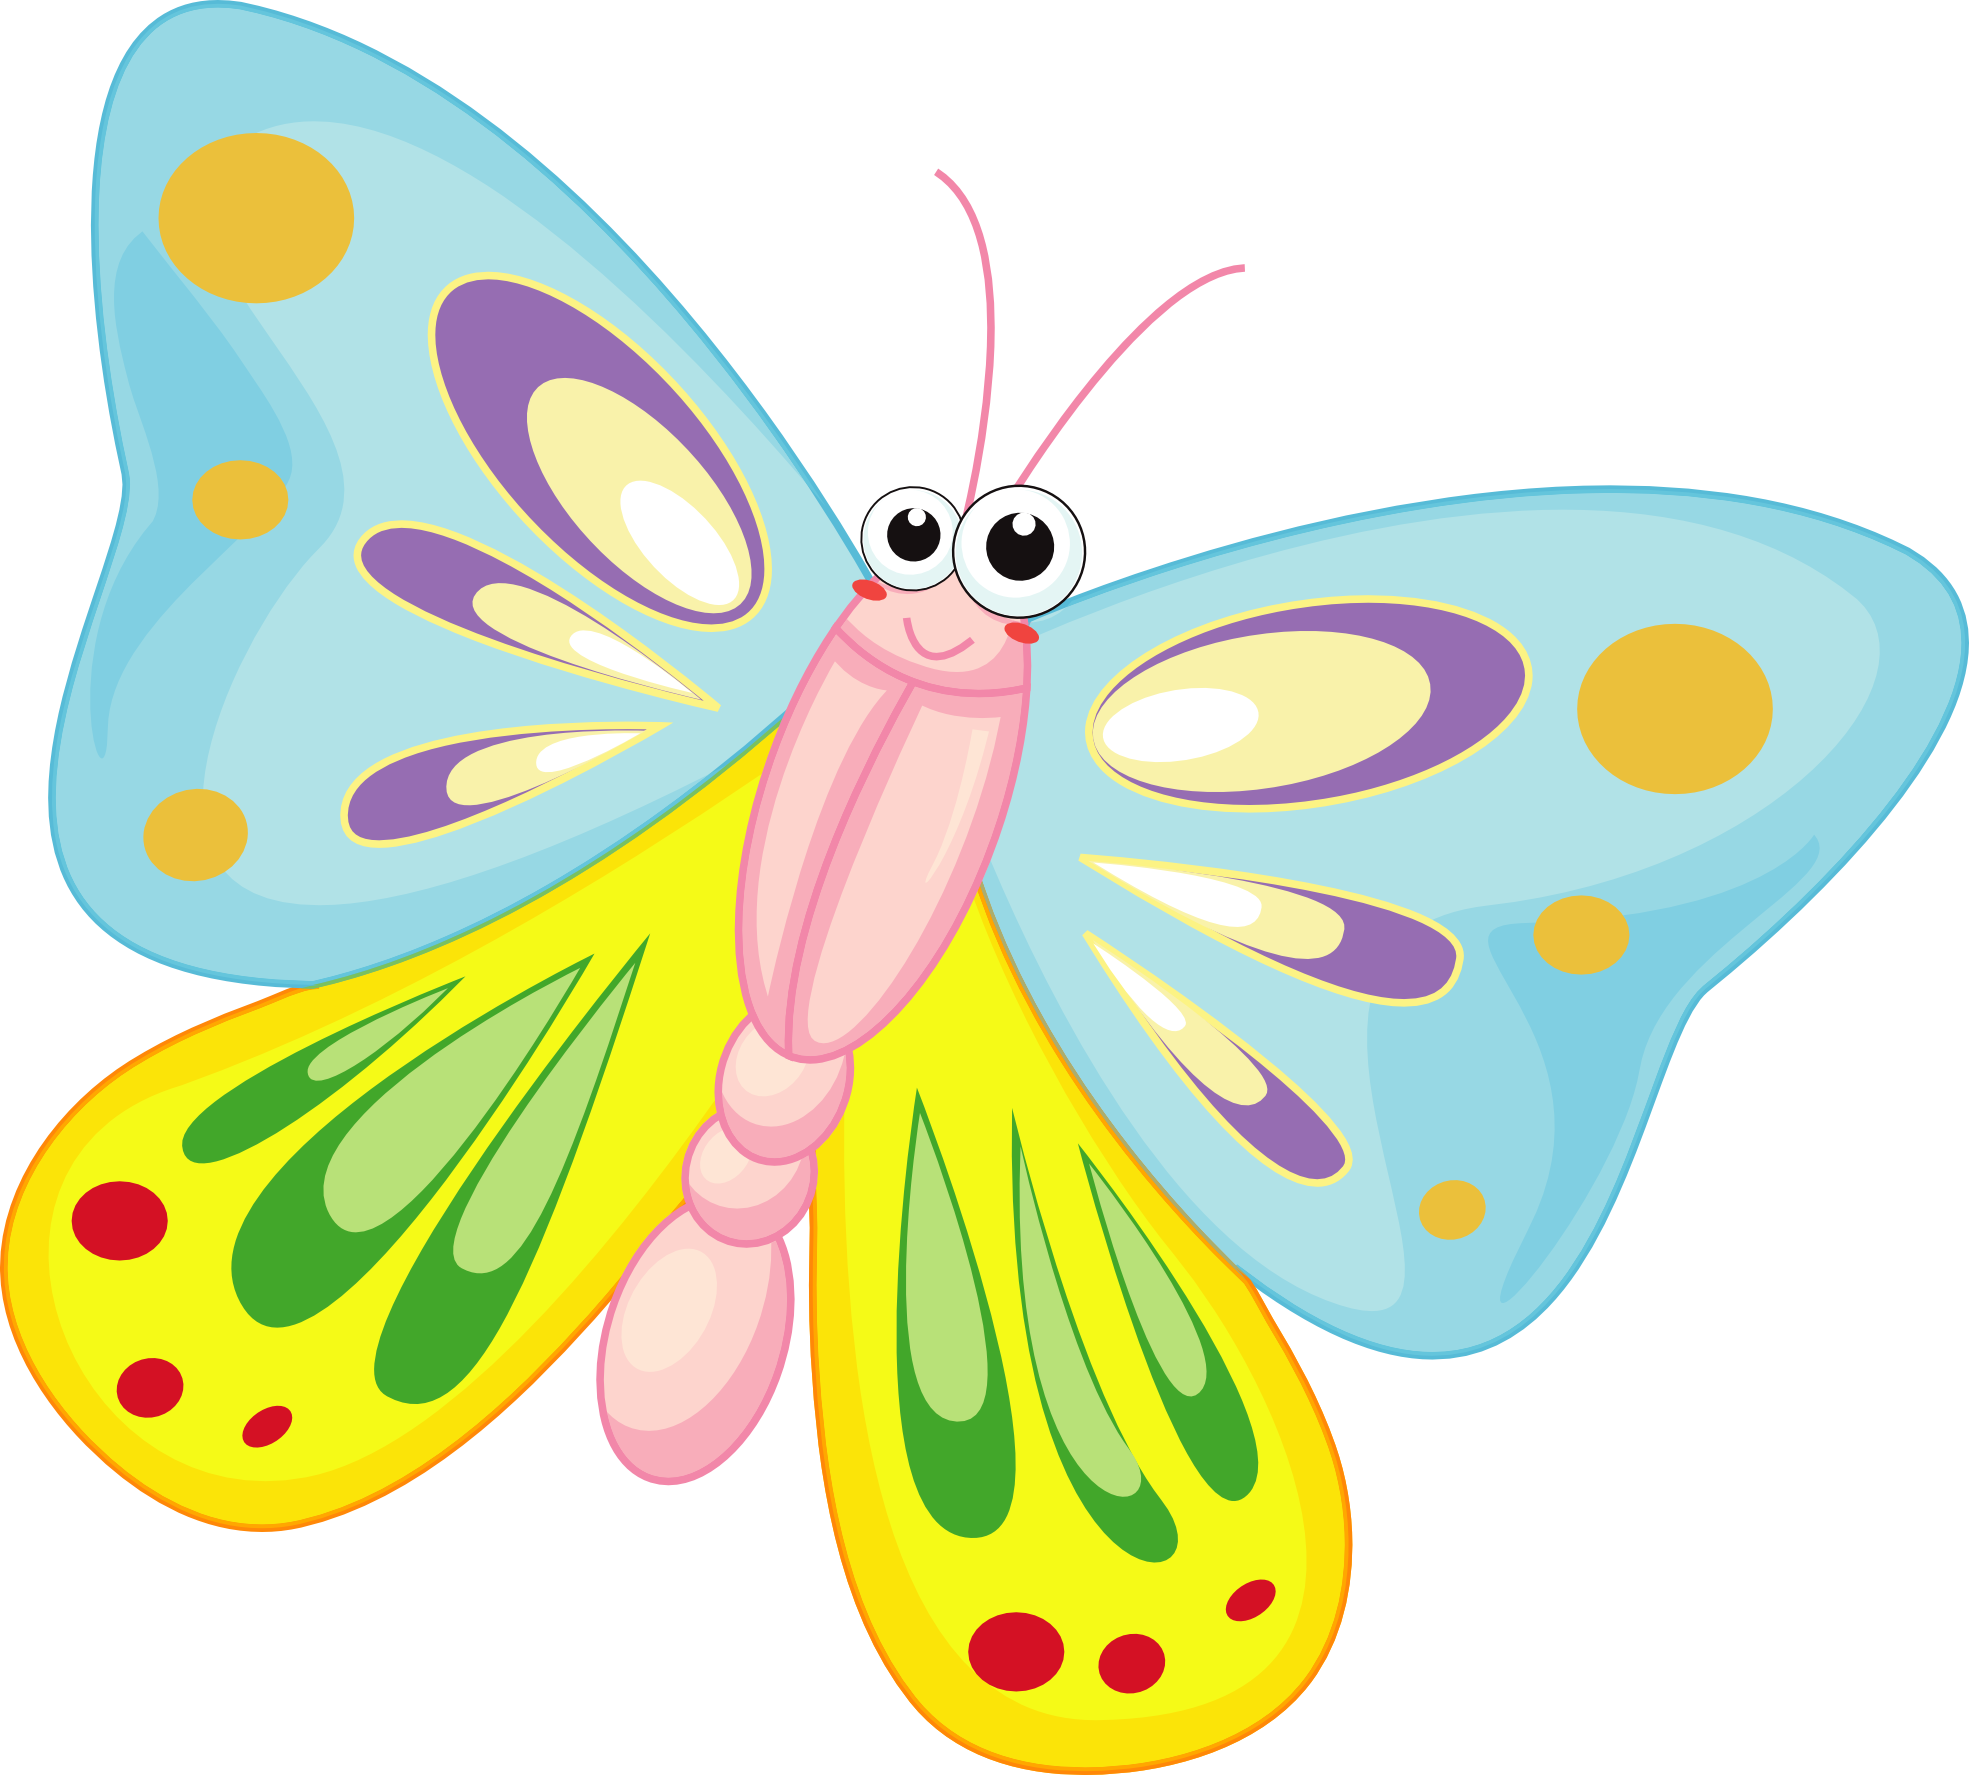 Butterflies cartoon group free. Grains clipart animated